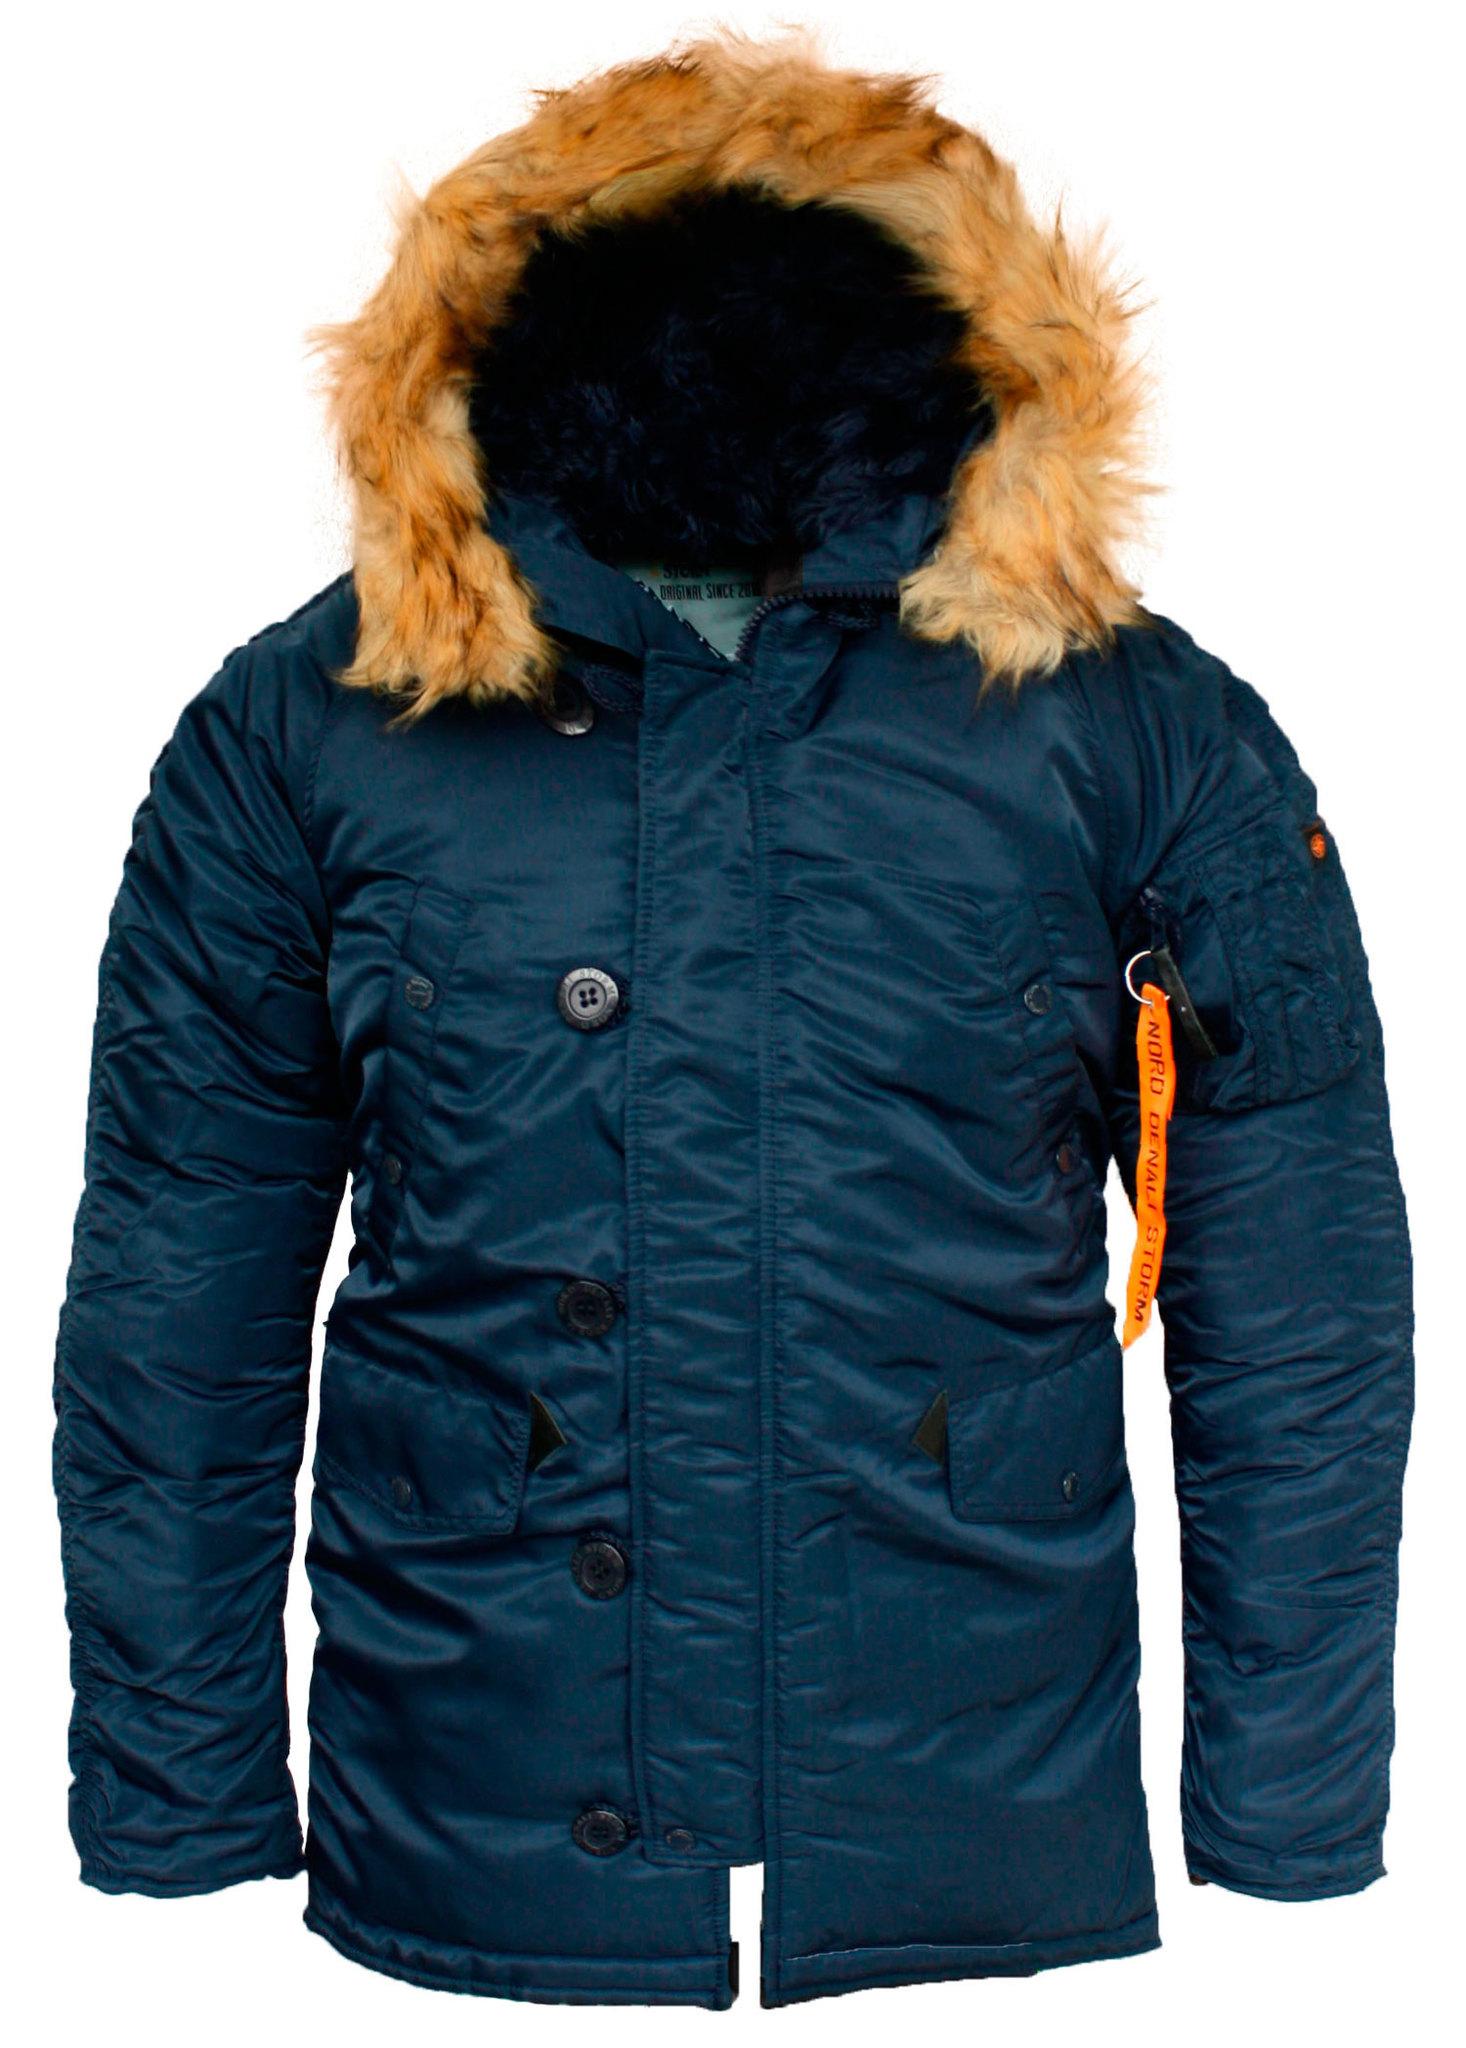 Куртка Аляска N-3B  Husky Denali (т.синяя - ink/ink)